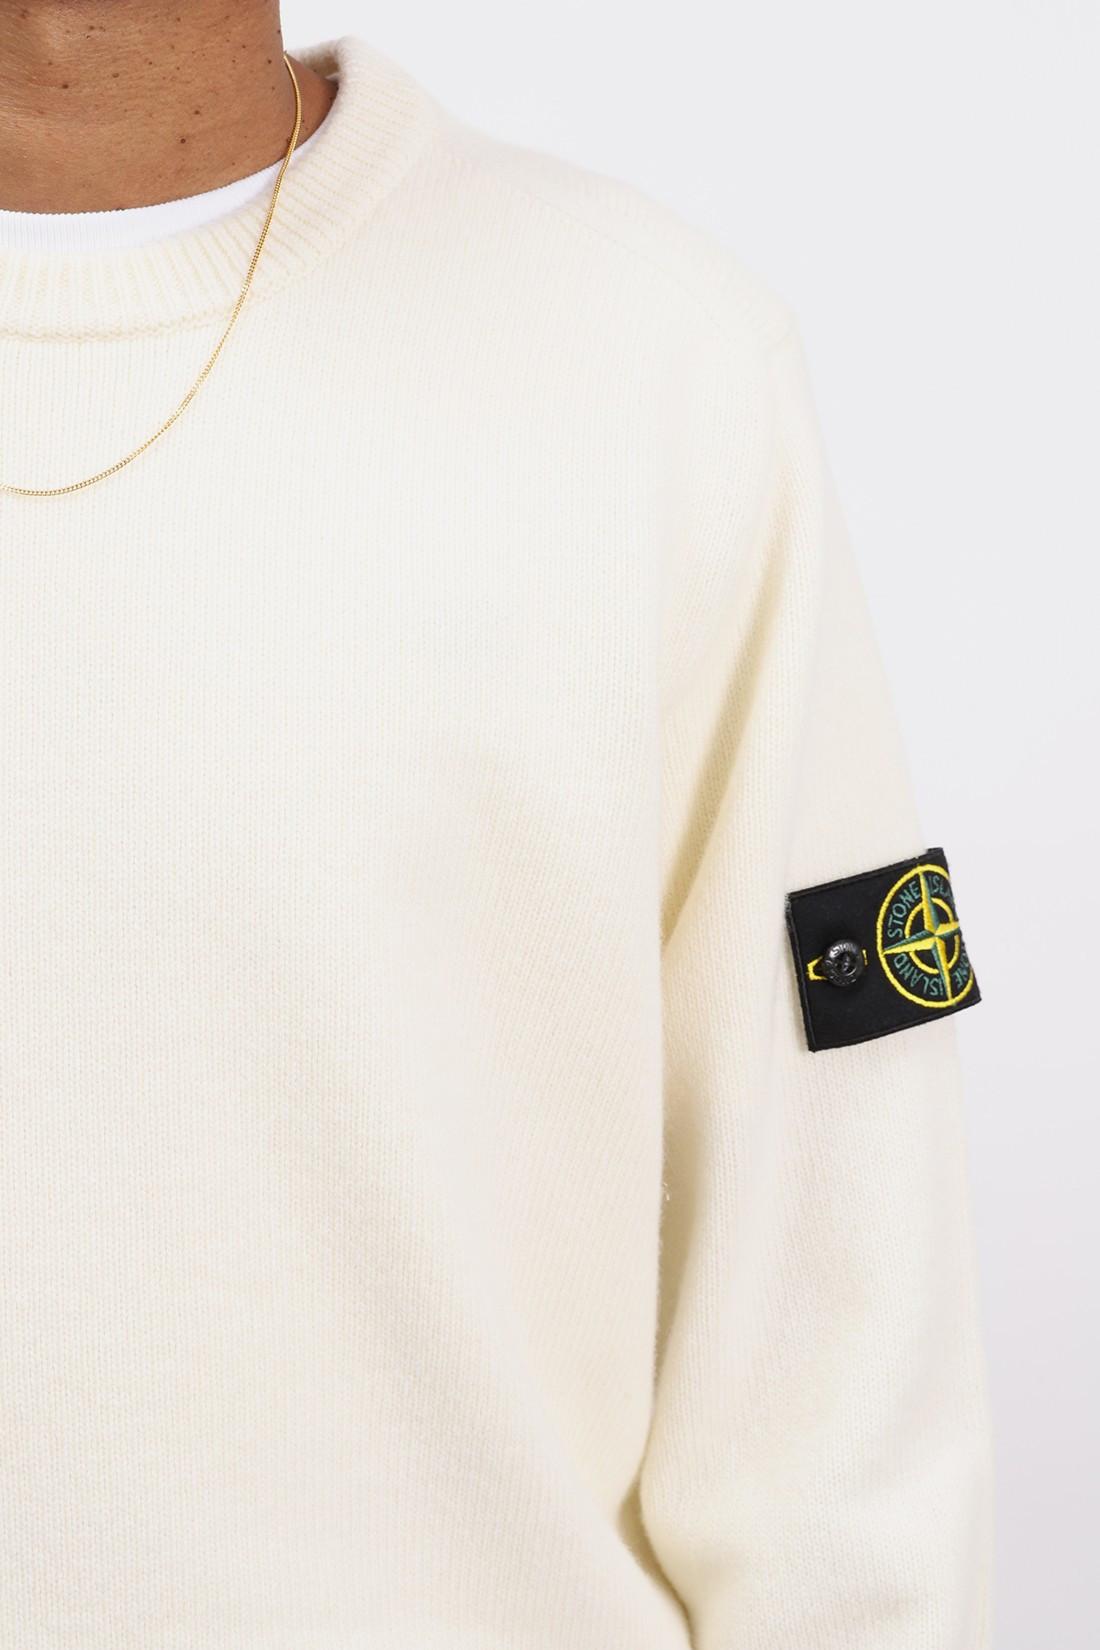 STONE ISLAND / 535a3 classic knit v0099 Bianco naturale